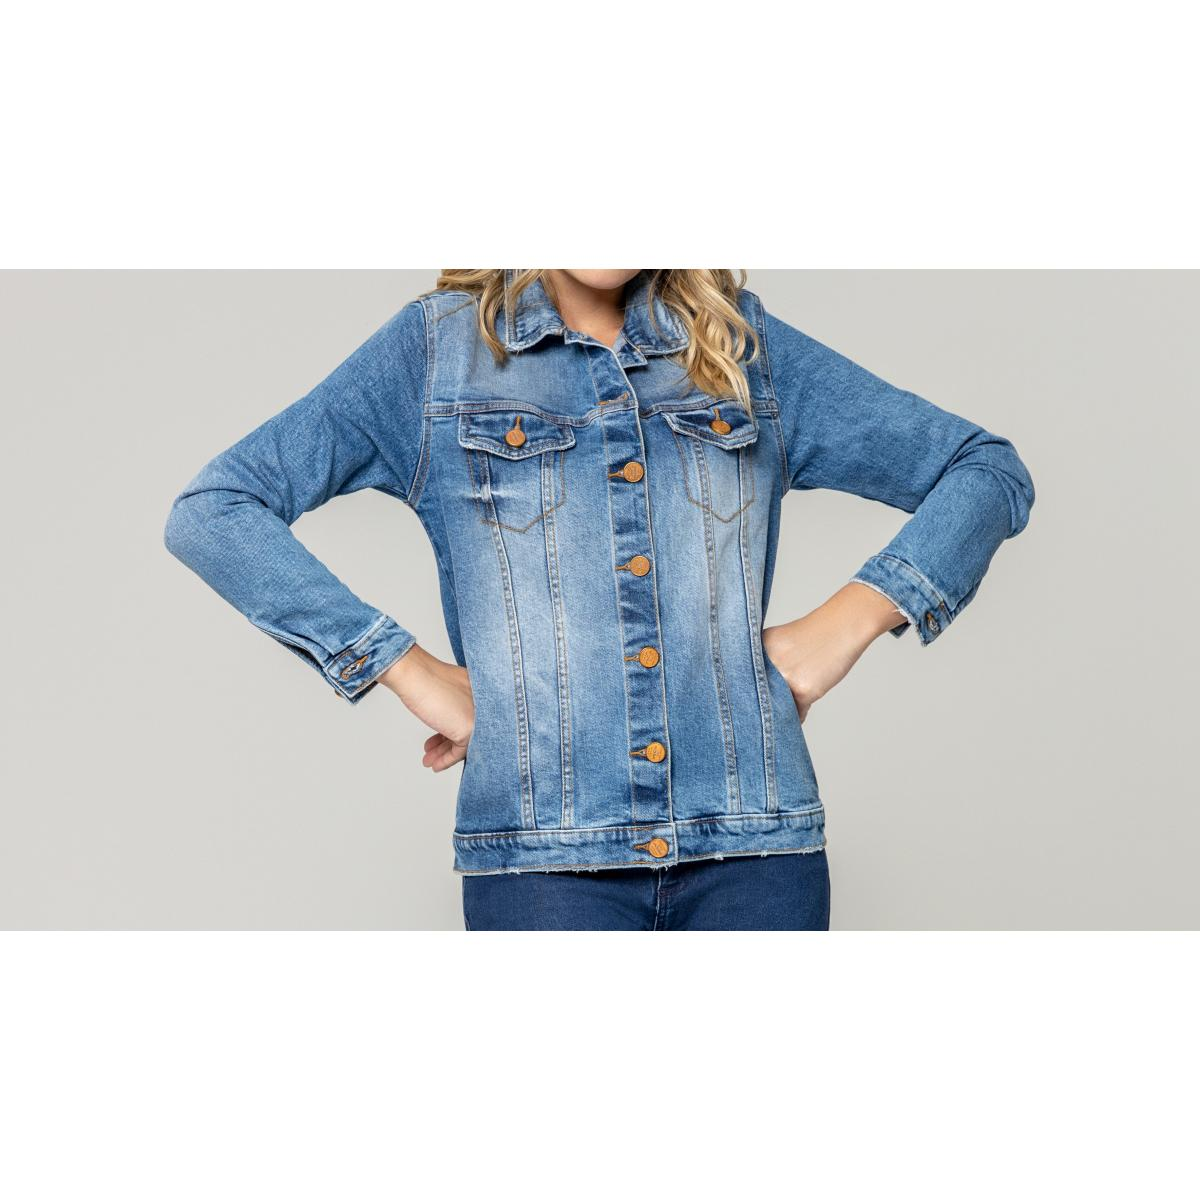 Jaqueta Feminina Index 06.01.000169 Jeans